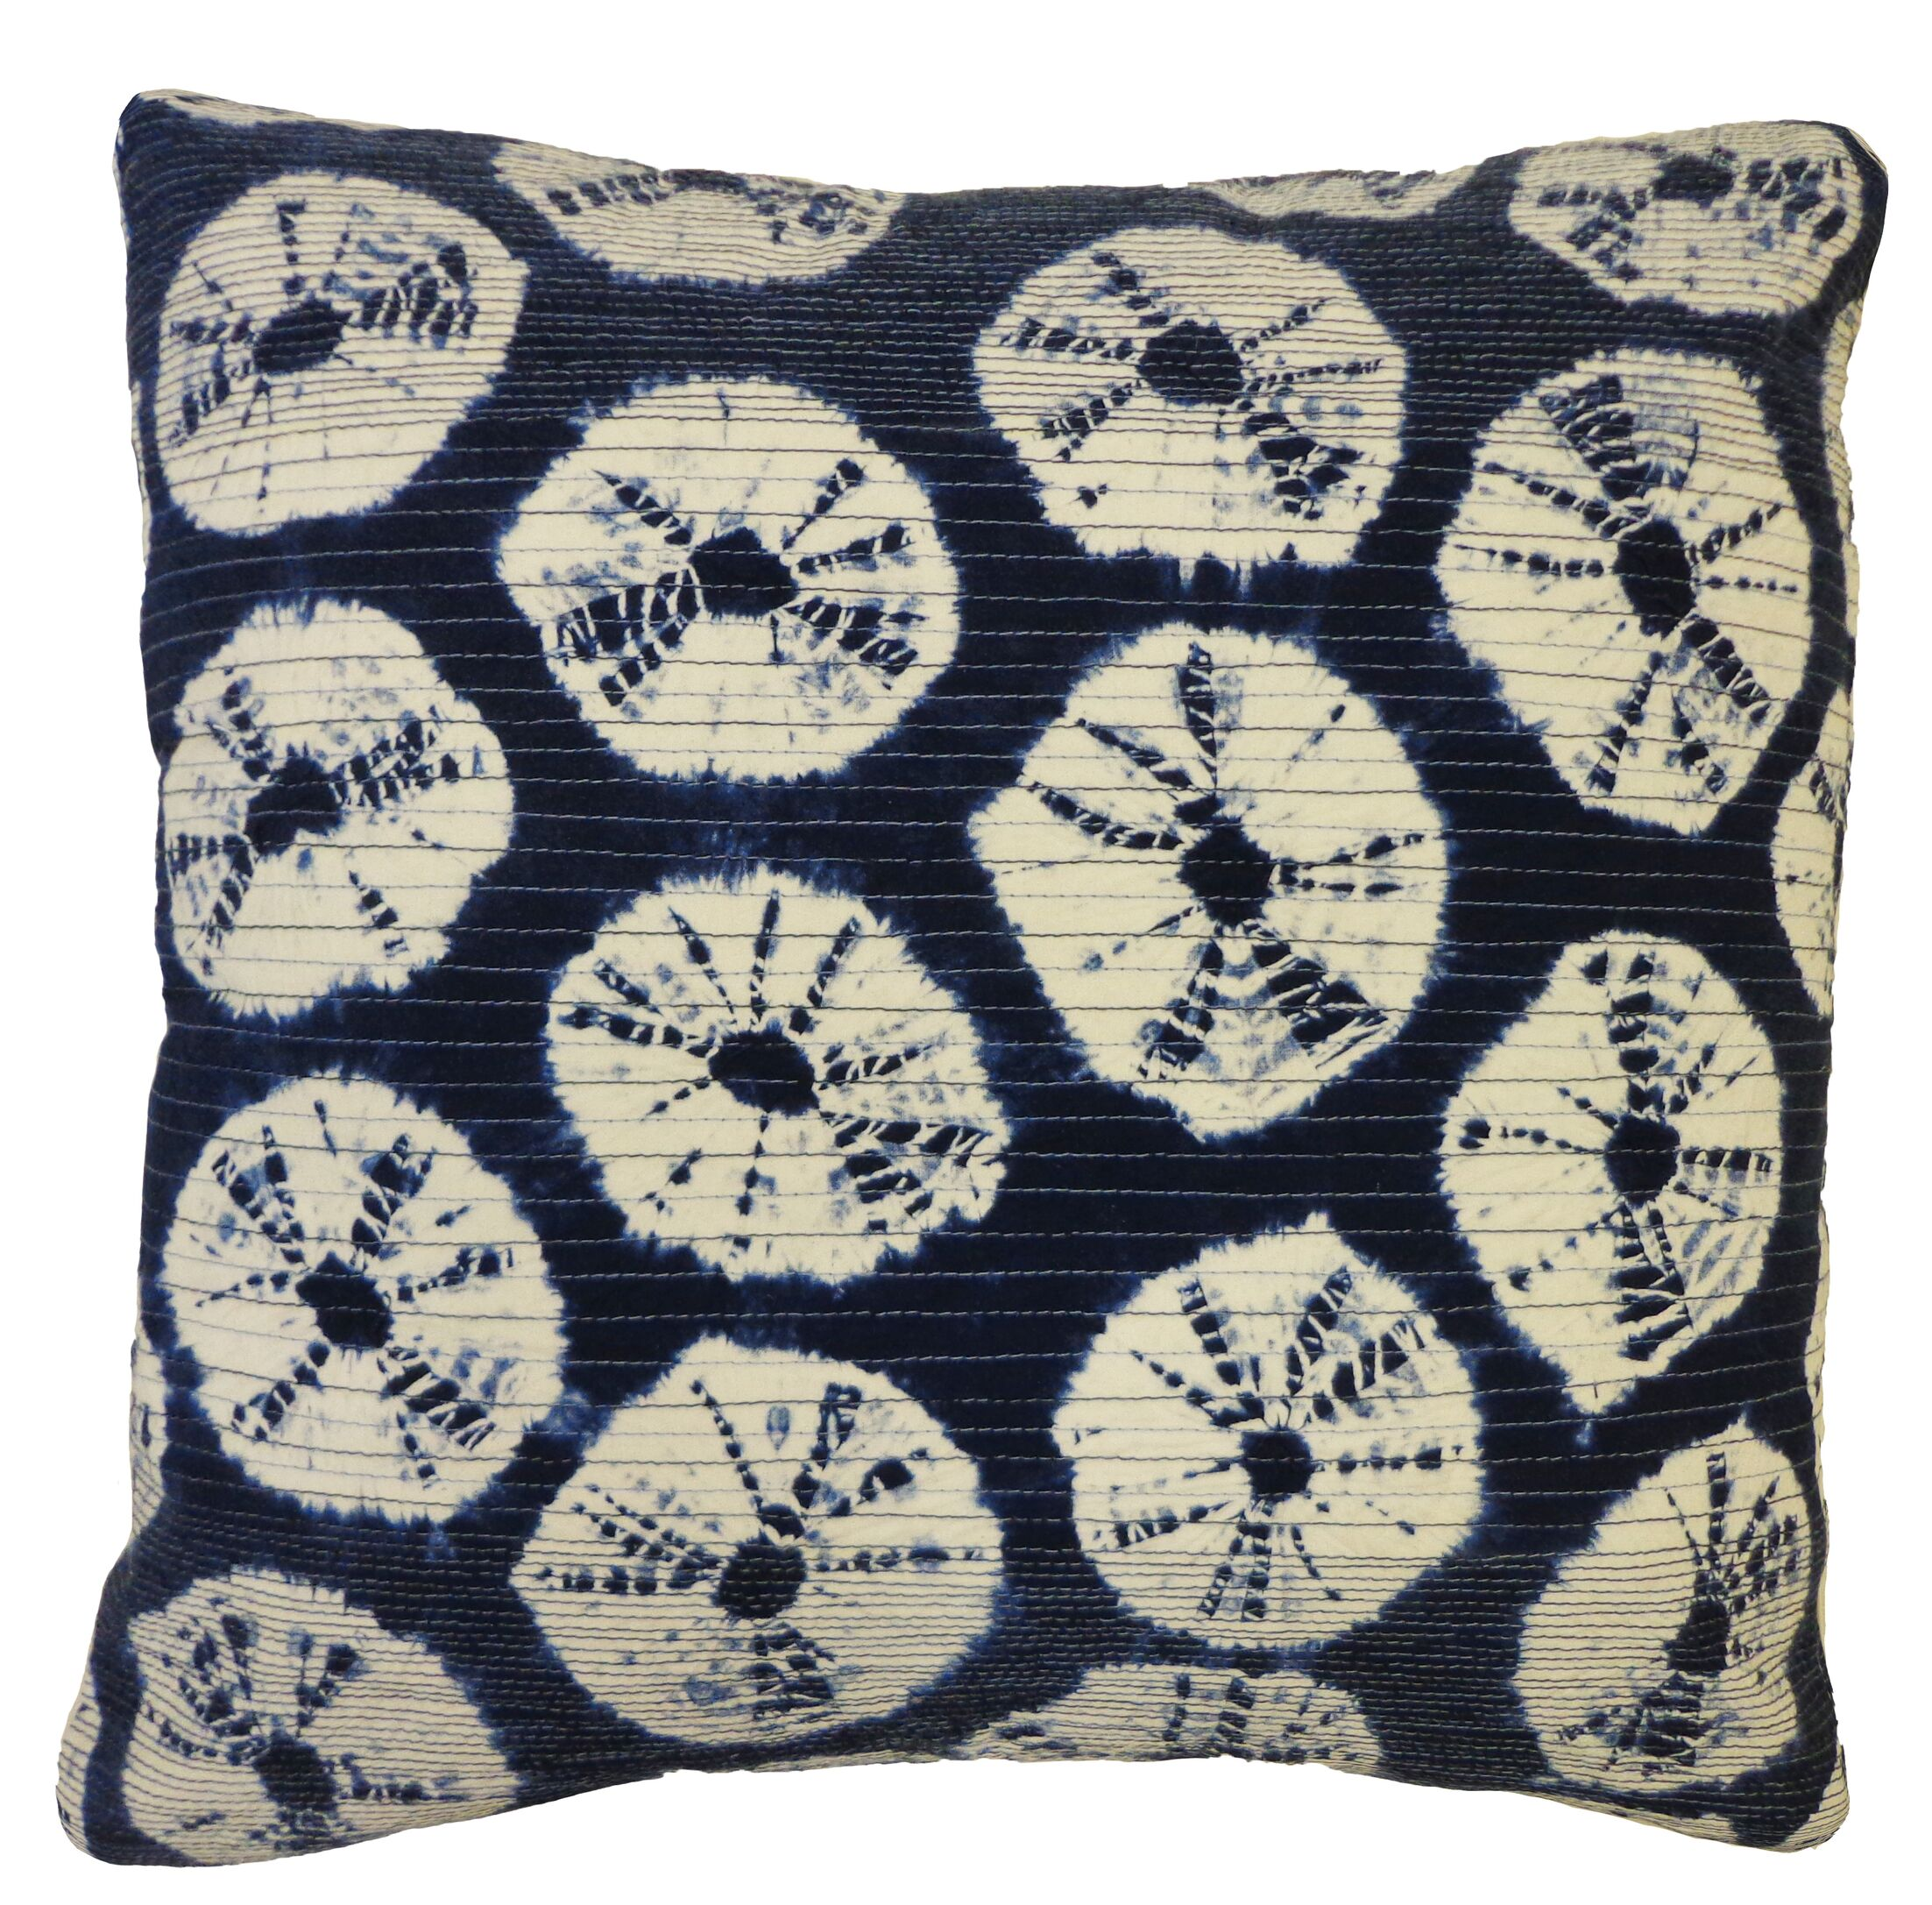 Bright & Fresh Japan Rings Cotton Throw Pillow